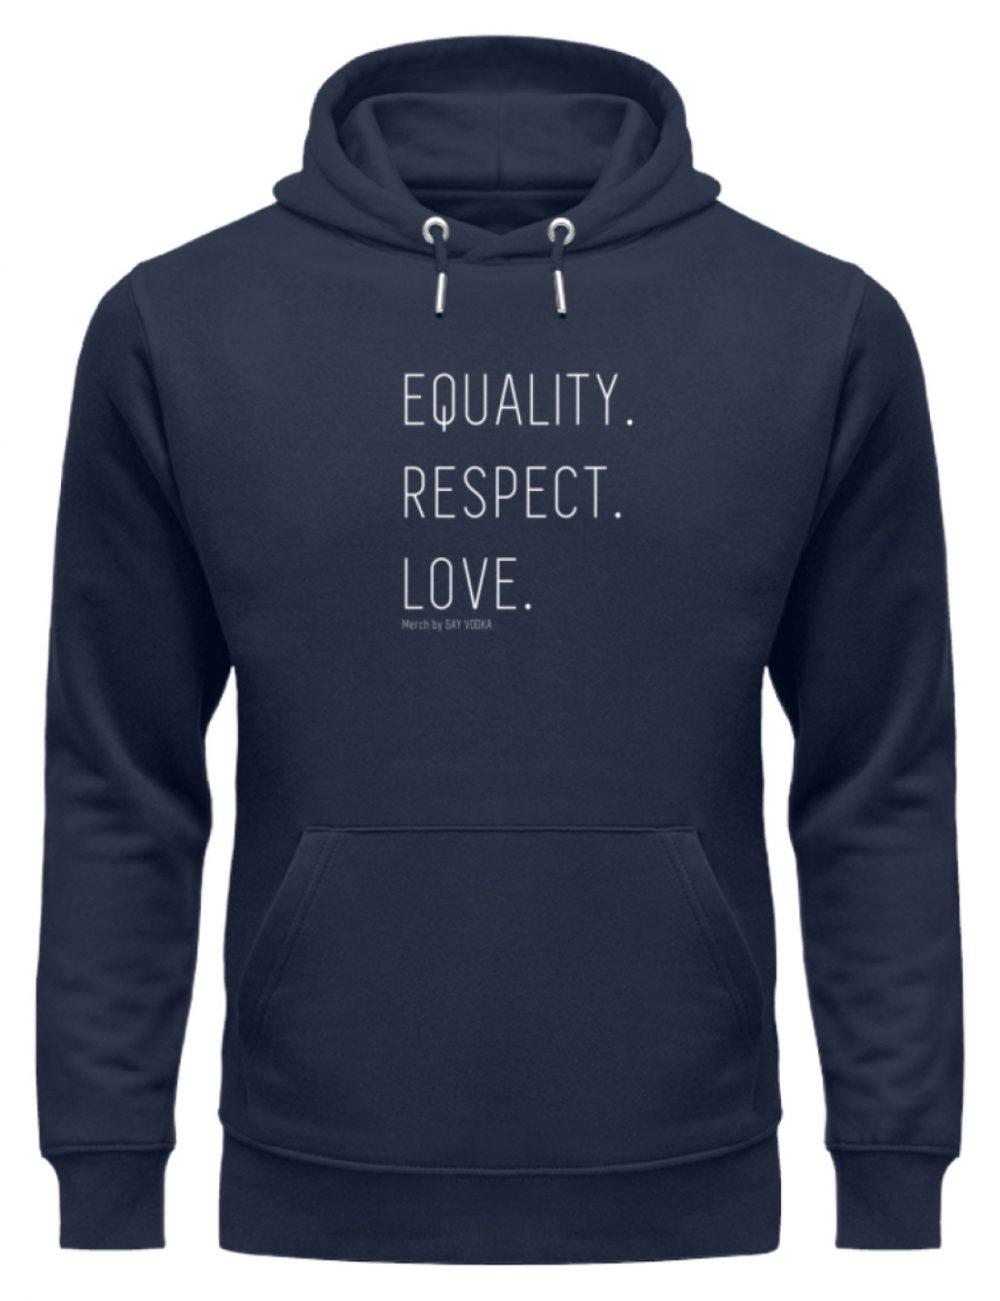 EQUALITY. RESPECT. LOVE. - Unisex Organic Hoodie-6887